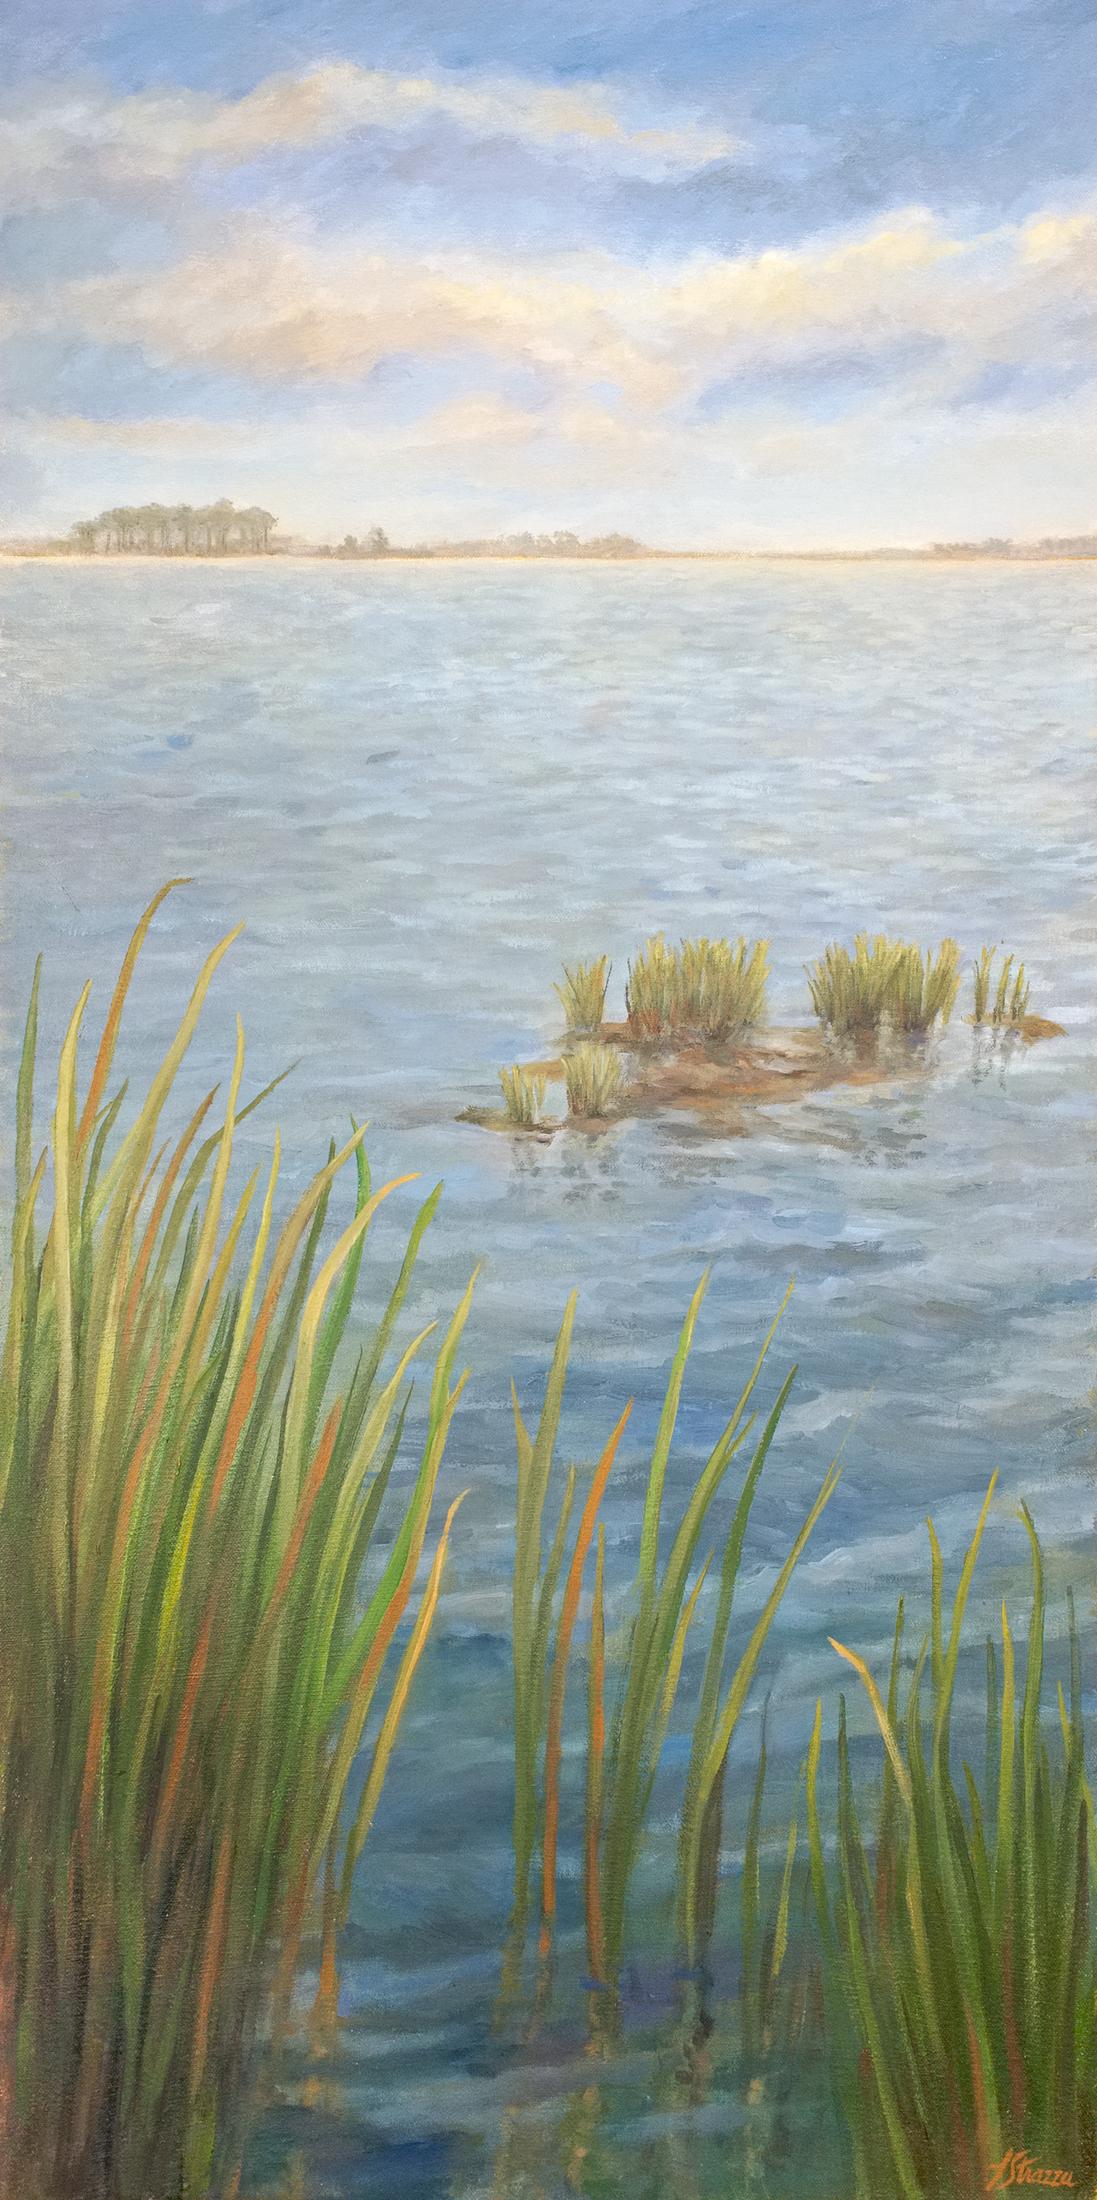 EbbTide Painting by Lisa Strazza